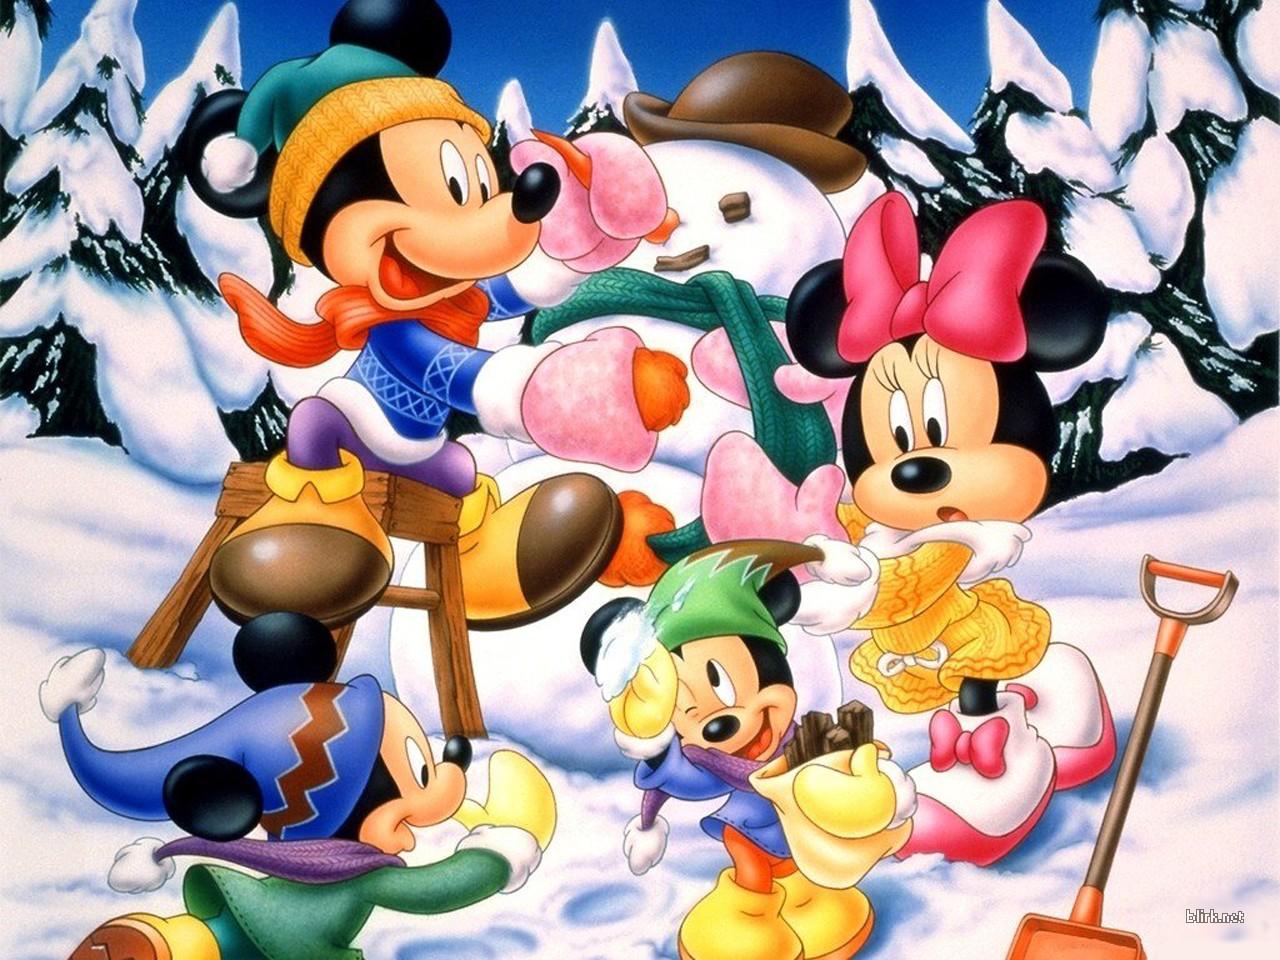 http://4.bp.blogspot.com/_WEruOs3QiZ8/TPz1g0jj6fI/AAAAAAAAABc/ncZEdz0vs78/s1600/mickey-mouse-wallpaper-2.jpg